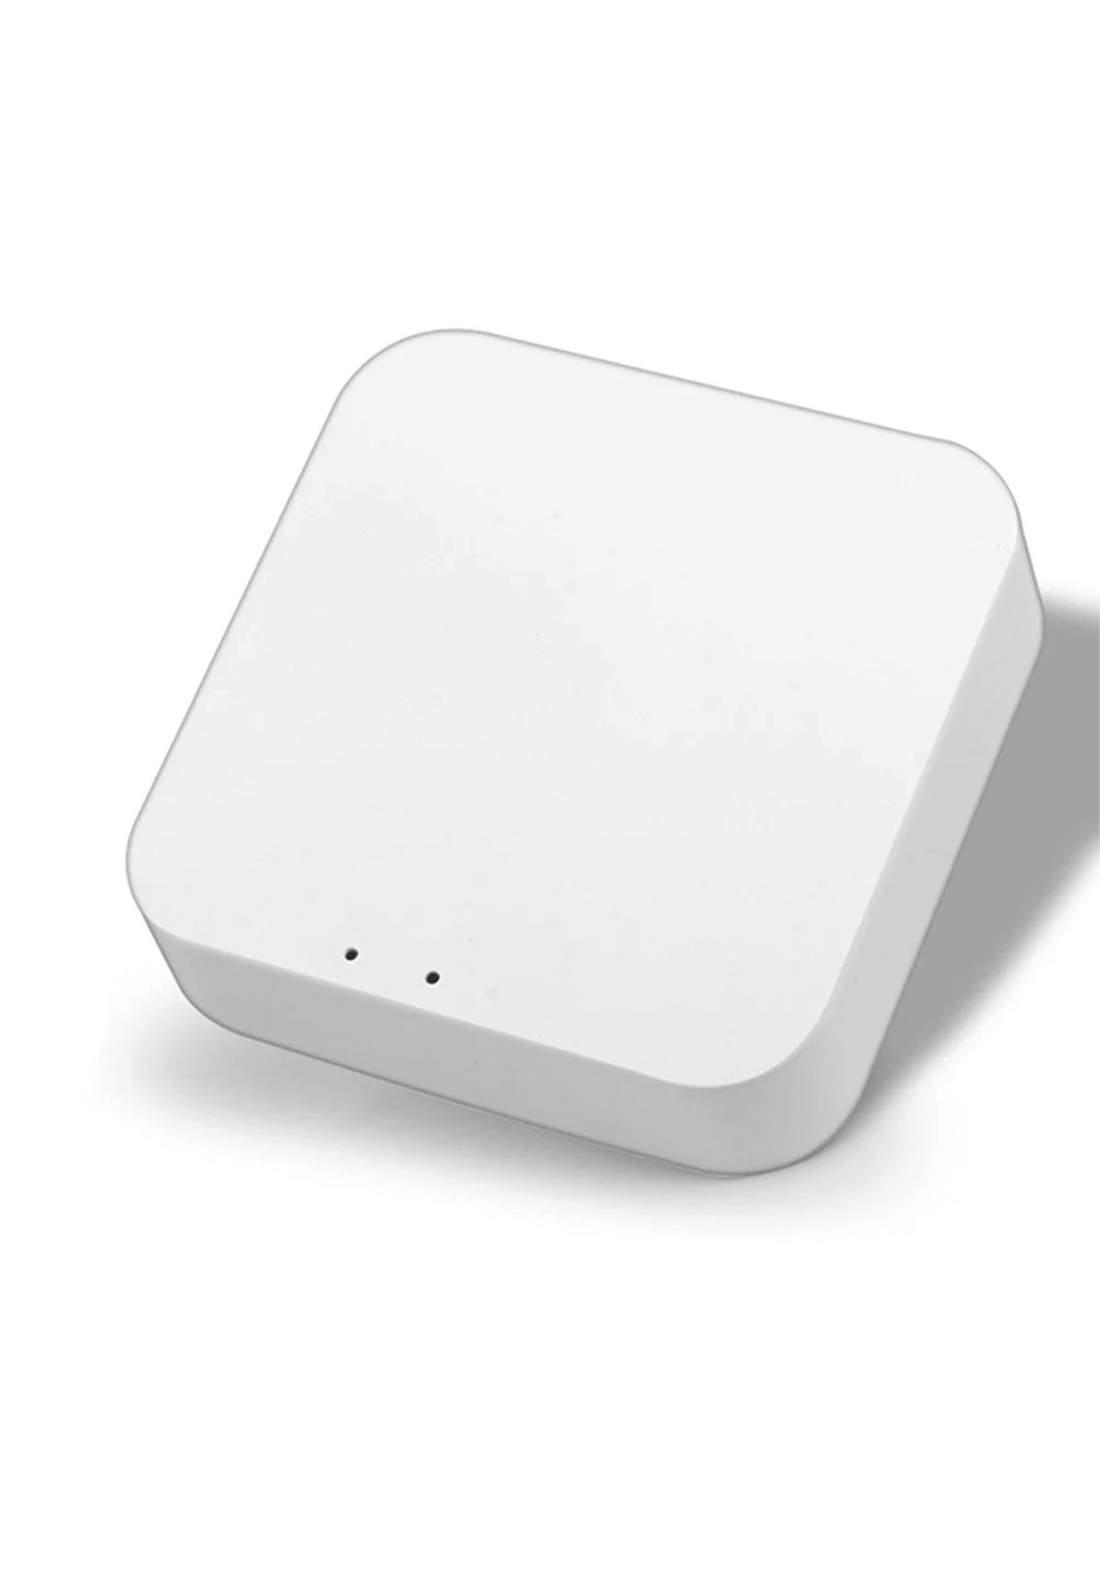 Zigbee Hub ZWGWZ مركز التحكم الذكي في الملحقات